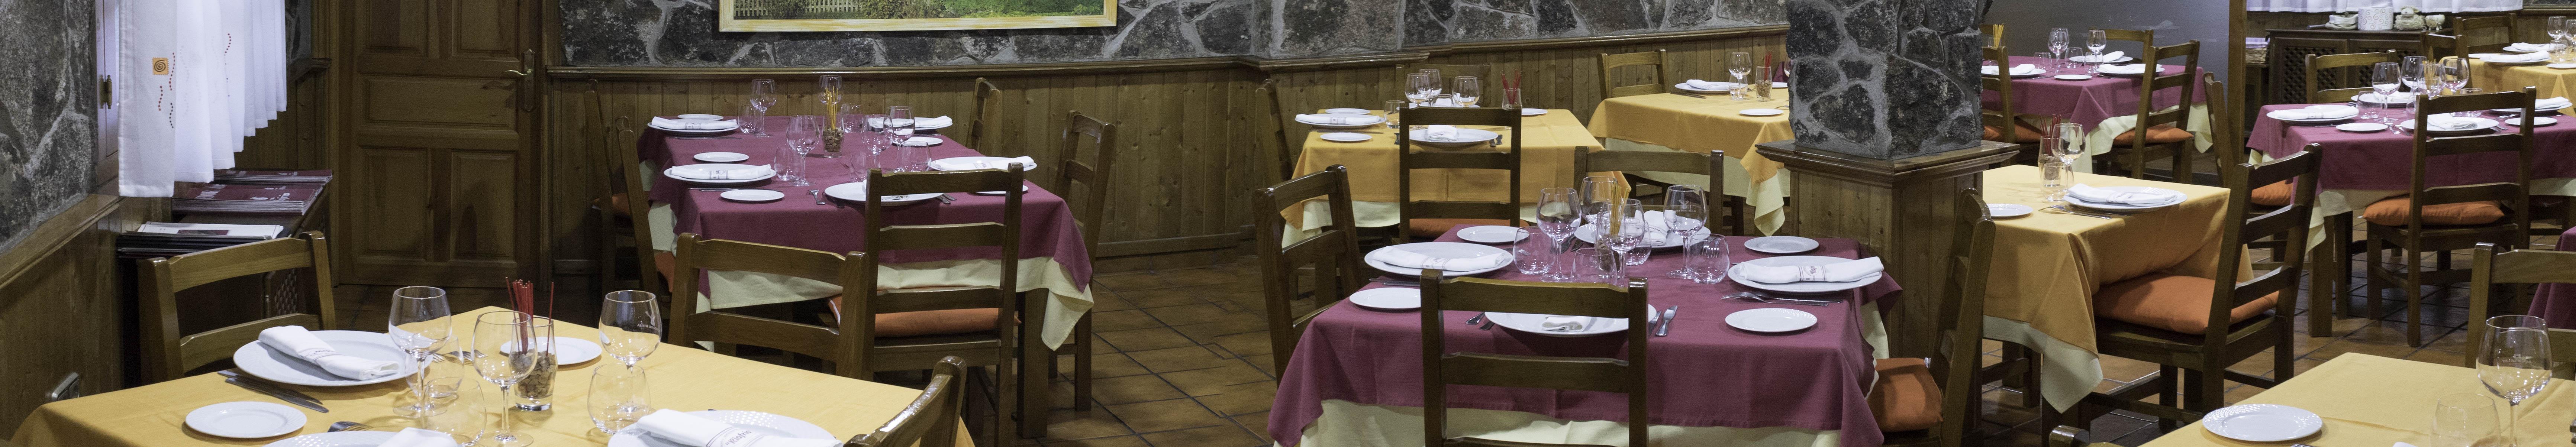 Restaurante-04_12_17_19-Pano-1